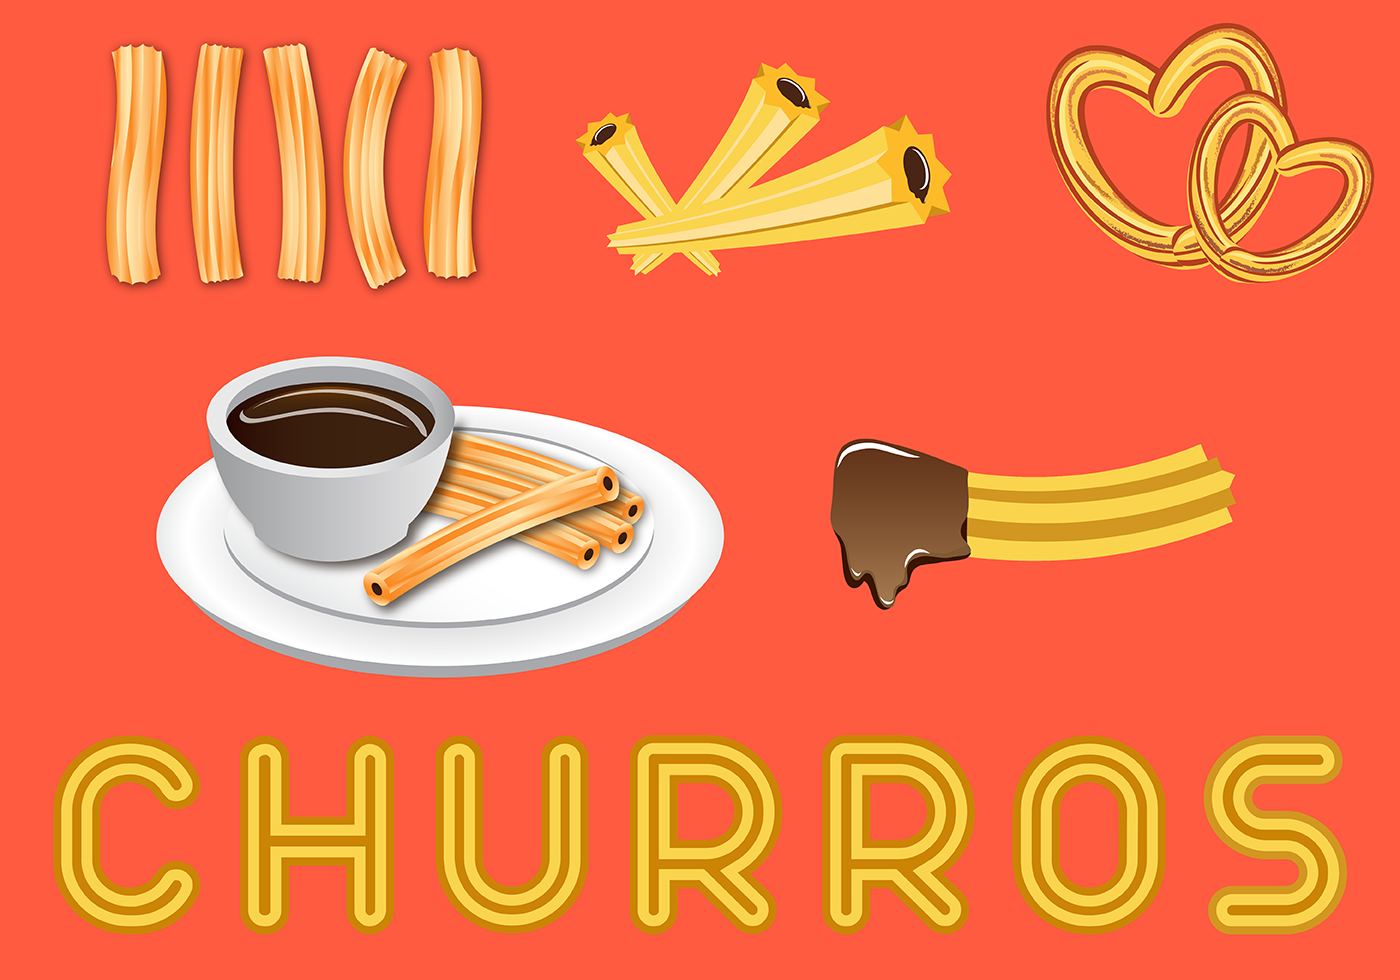 Free Delicious Churros Vector Download Free Vector Art